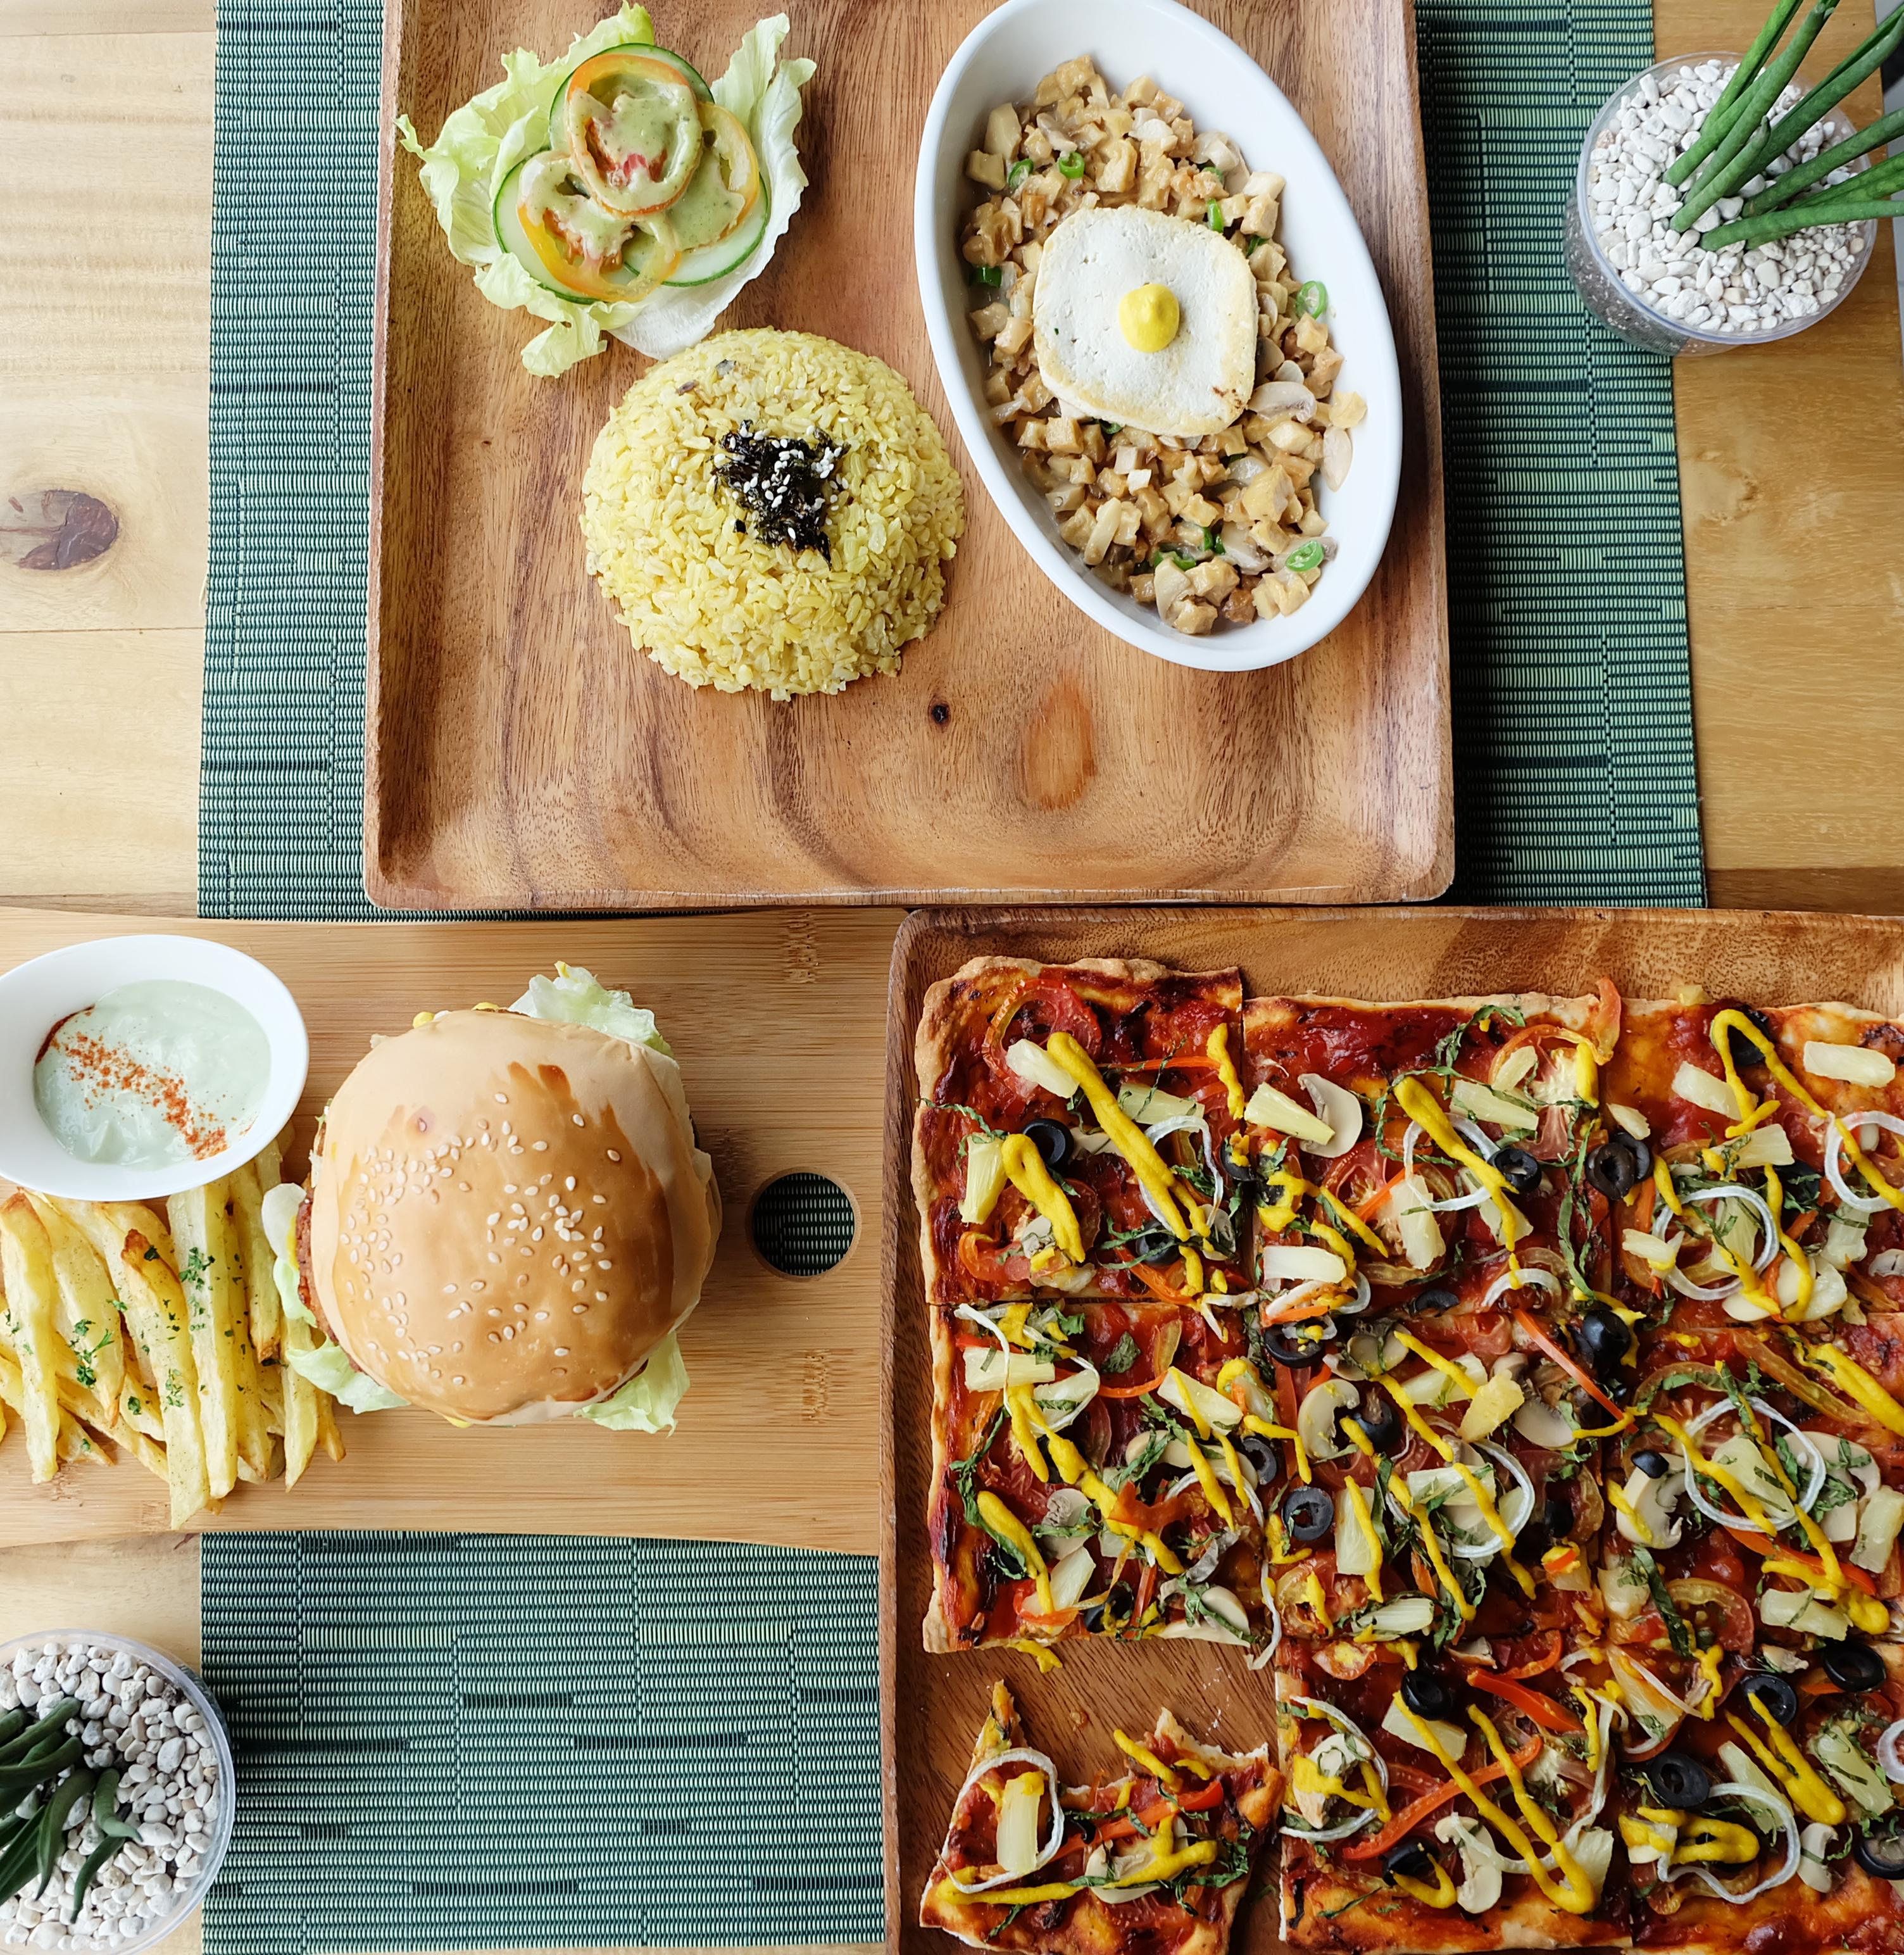 Enjoyable Greens @ Lun-Haw Vegan Cafe